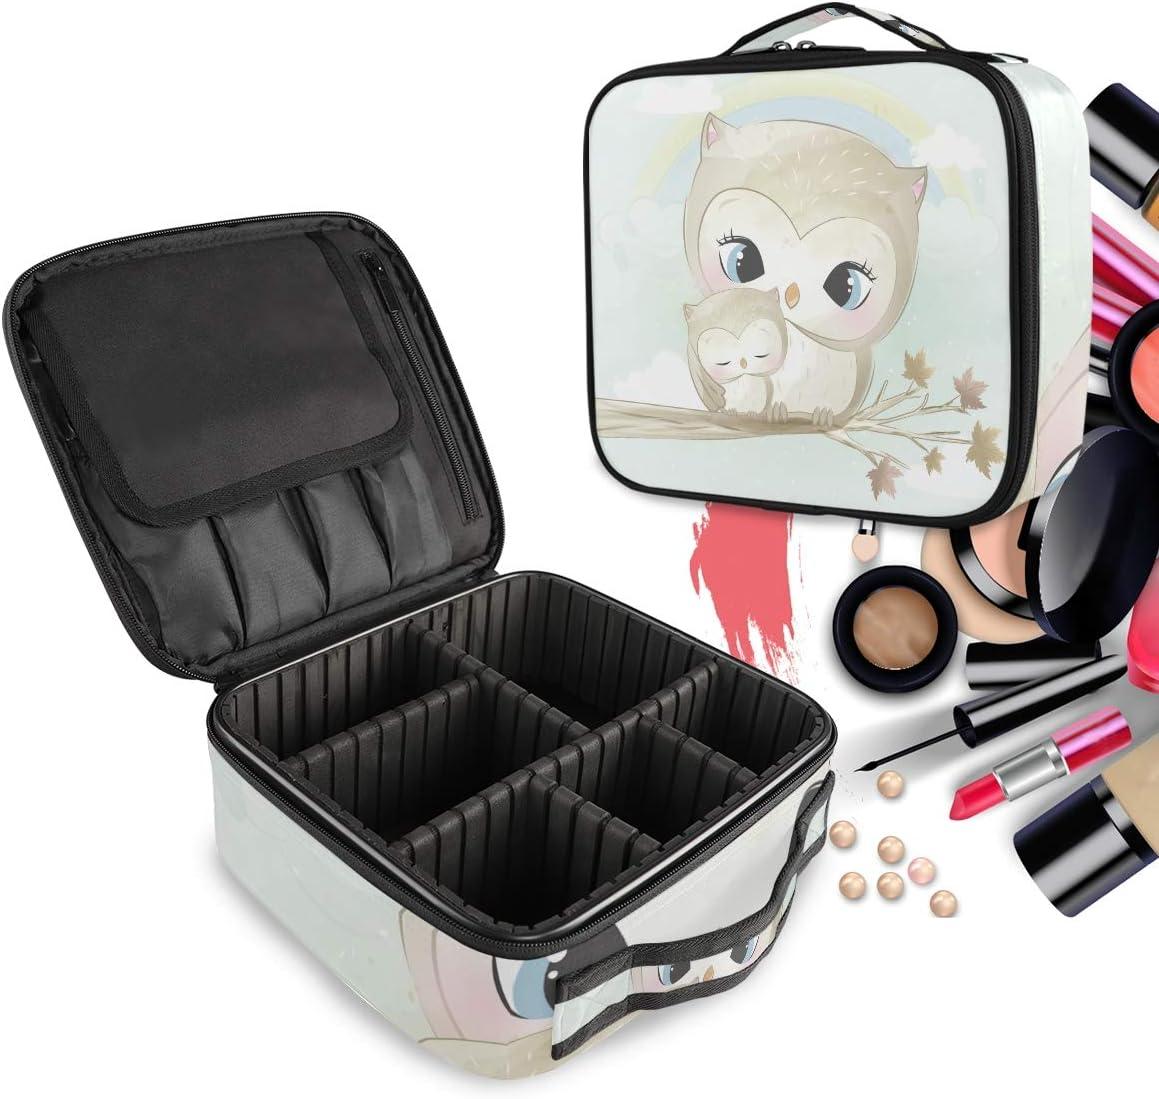 Búho Gris Madre Bebé Pájaro Bolsa de Maquillaje Organizador de Cosméticos Portátil Estuche Mochila con Divisor Ajustable para Mujeres Niñas